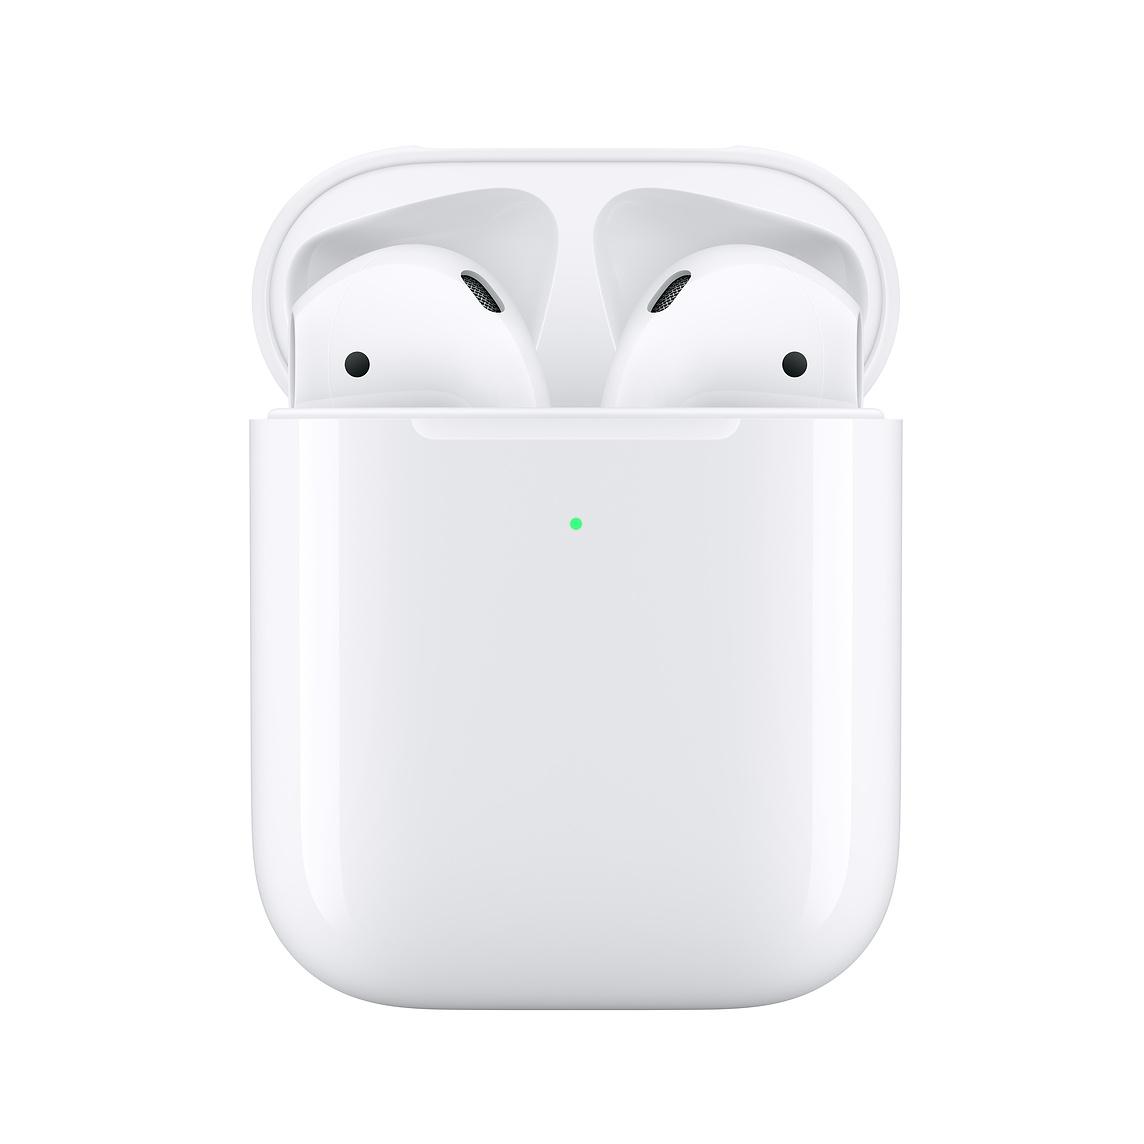 conrad apple airpods 2 generation mit wireless qi charging case mrxj2zm a bluetooth